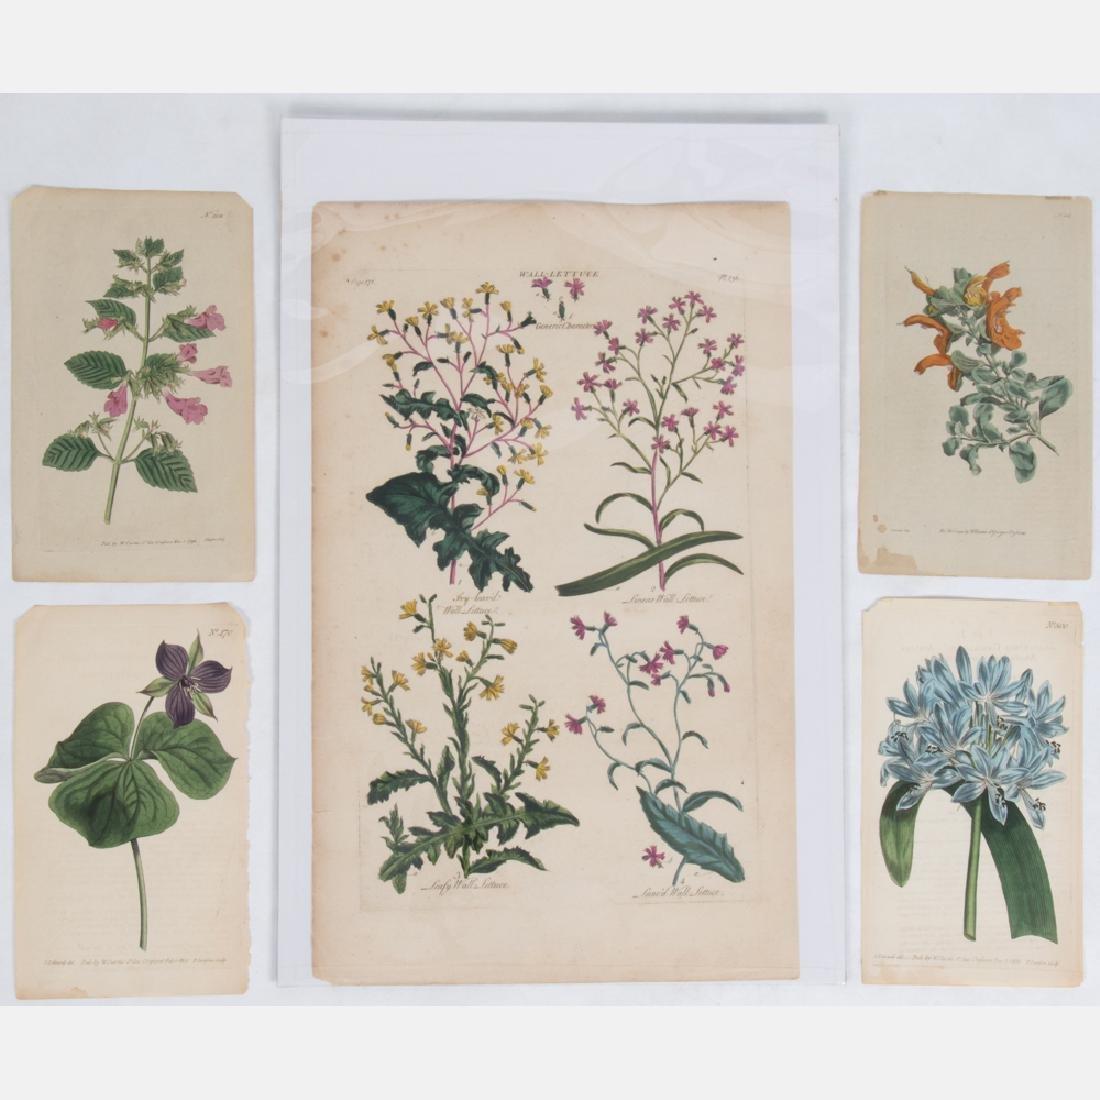 Sir John Hill (c. 1716-1775) Four Botanicals from